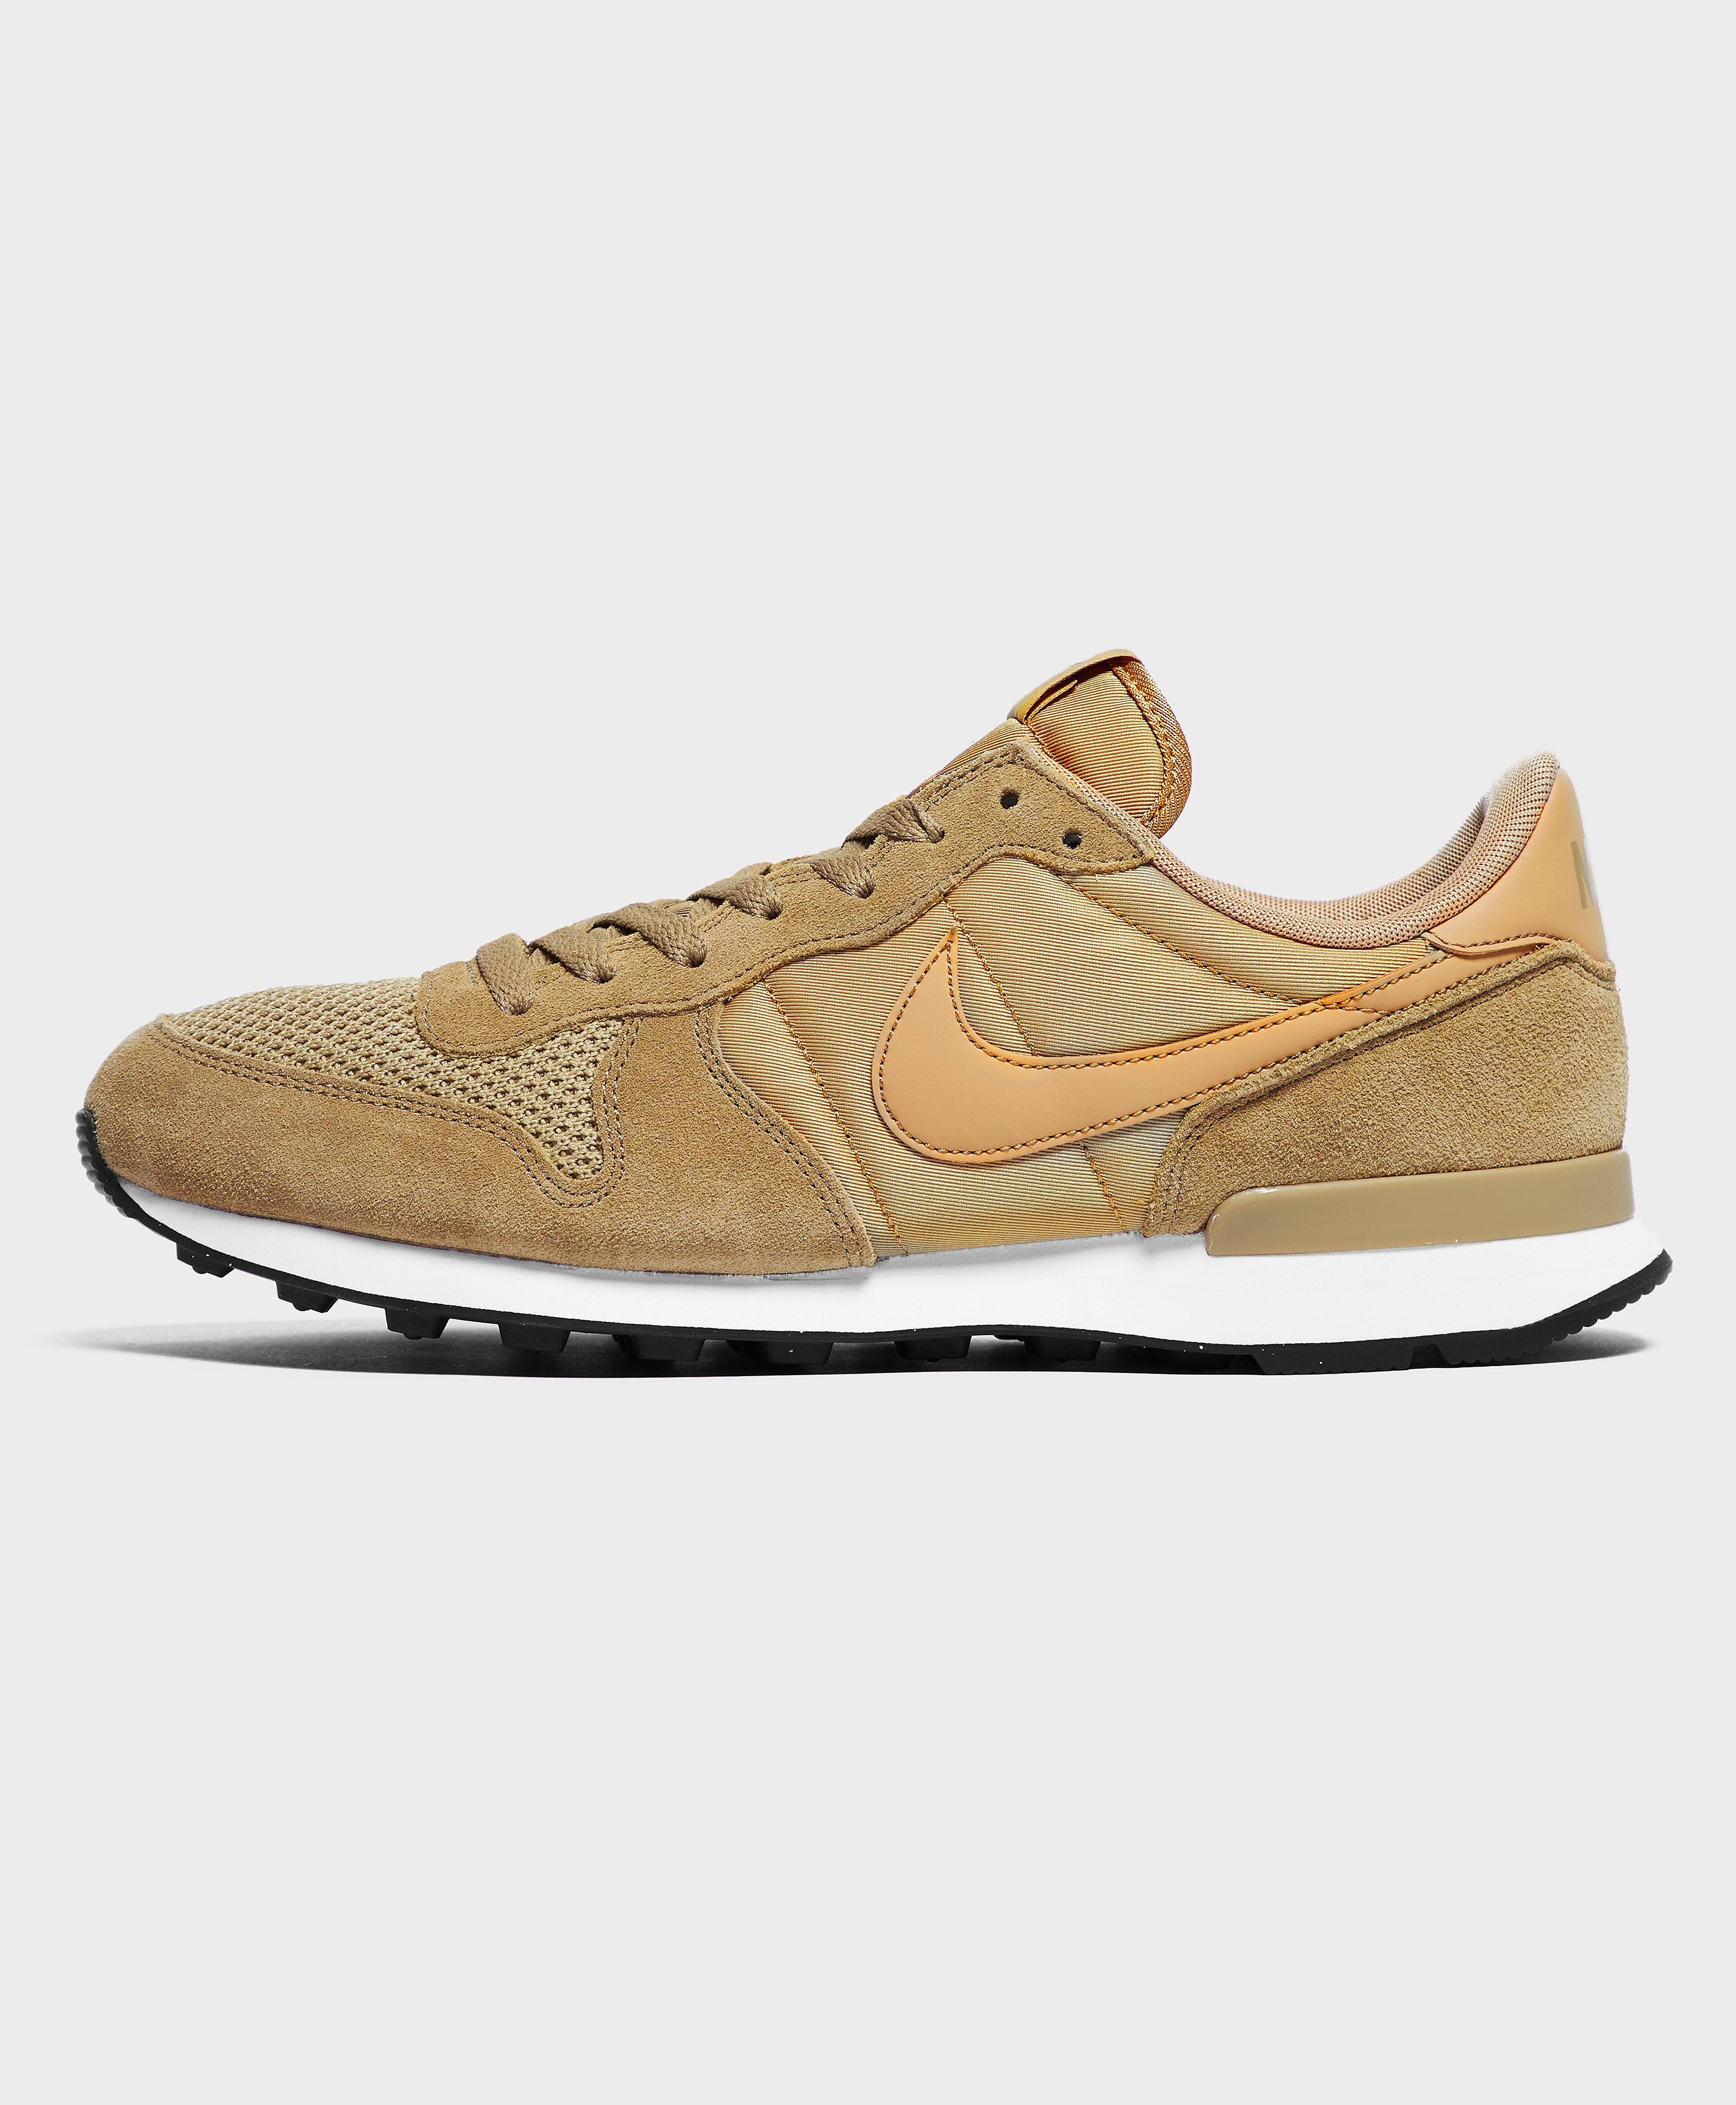 Nike Internationalist SE